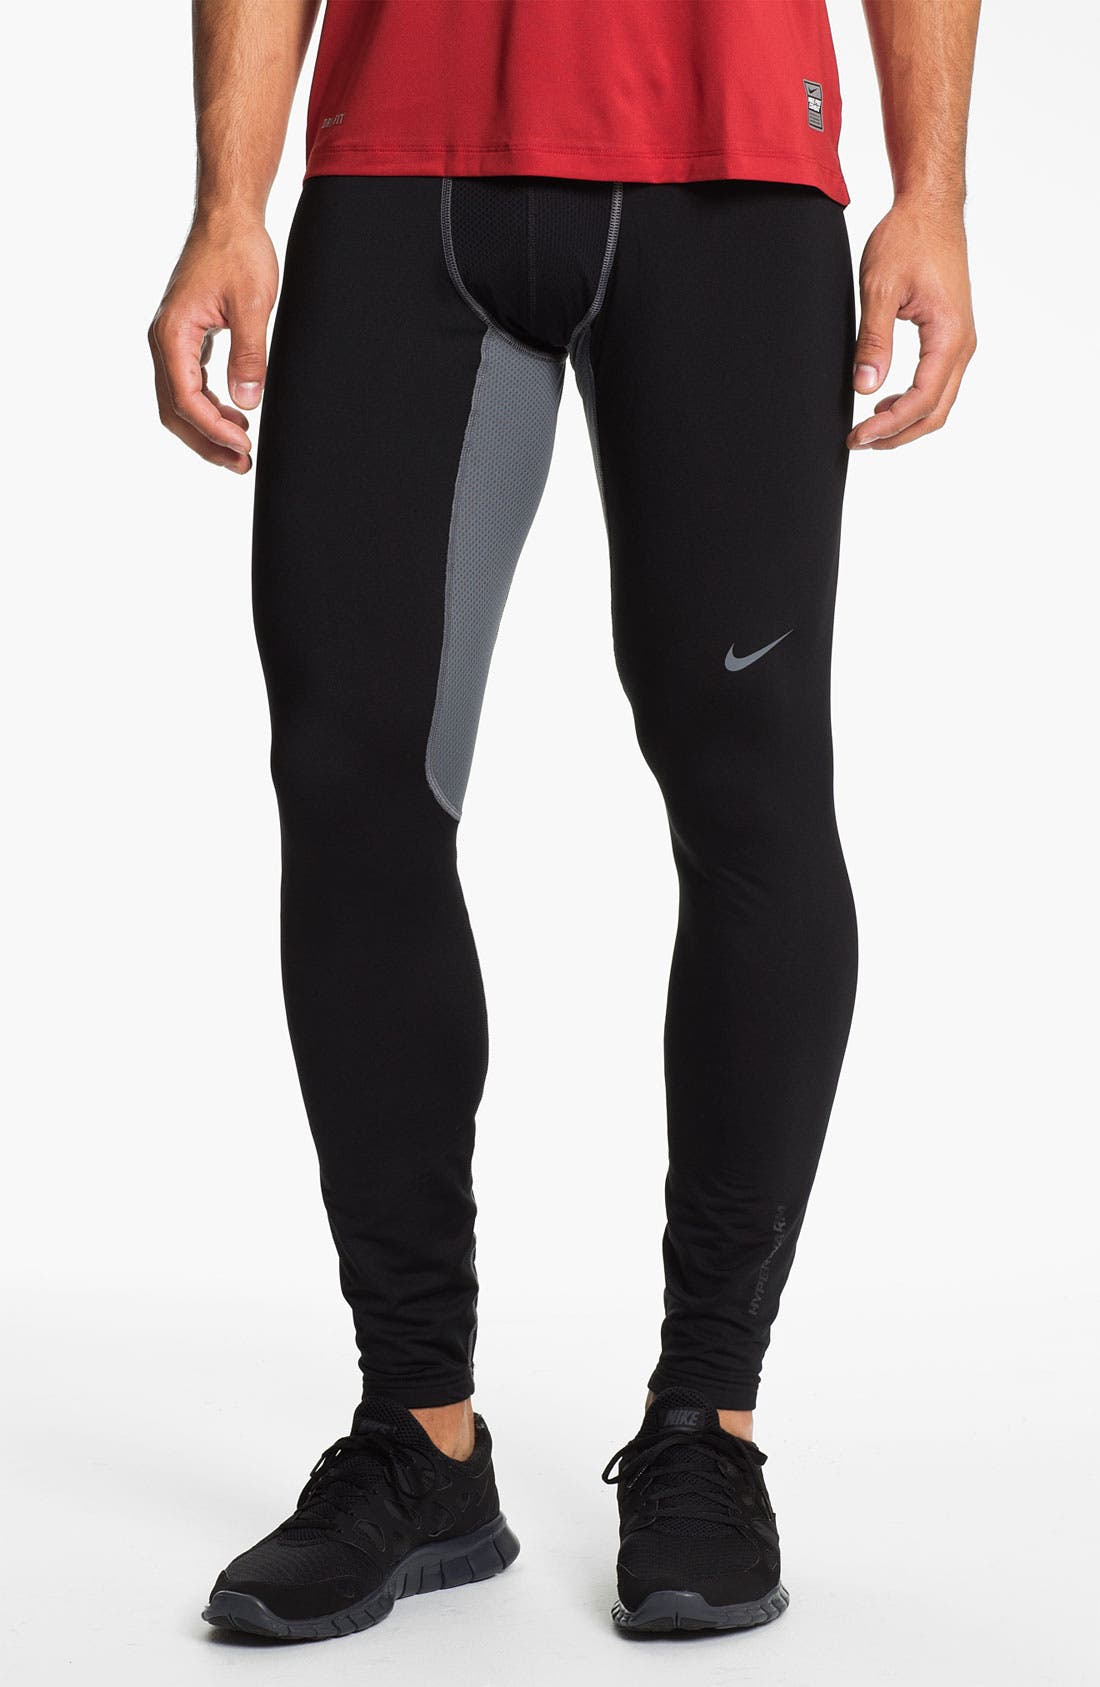 Main Image - Nike 'Hyperwarm' Dri-FIT Running Leggings (Online Exclusive)